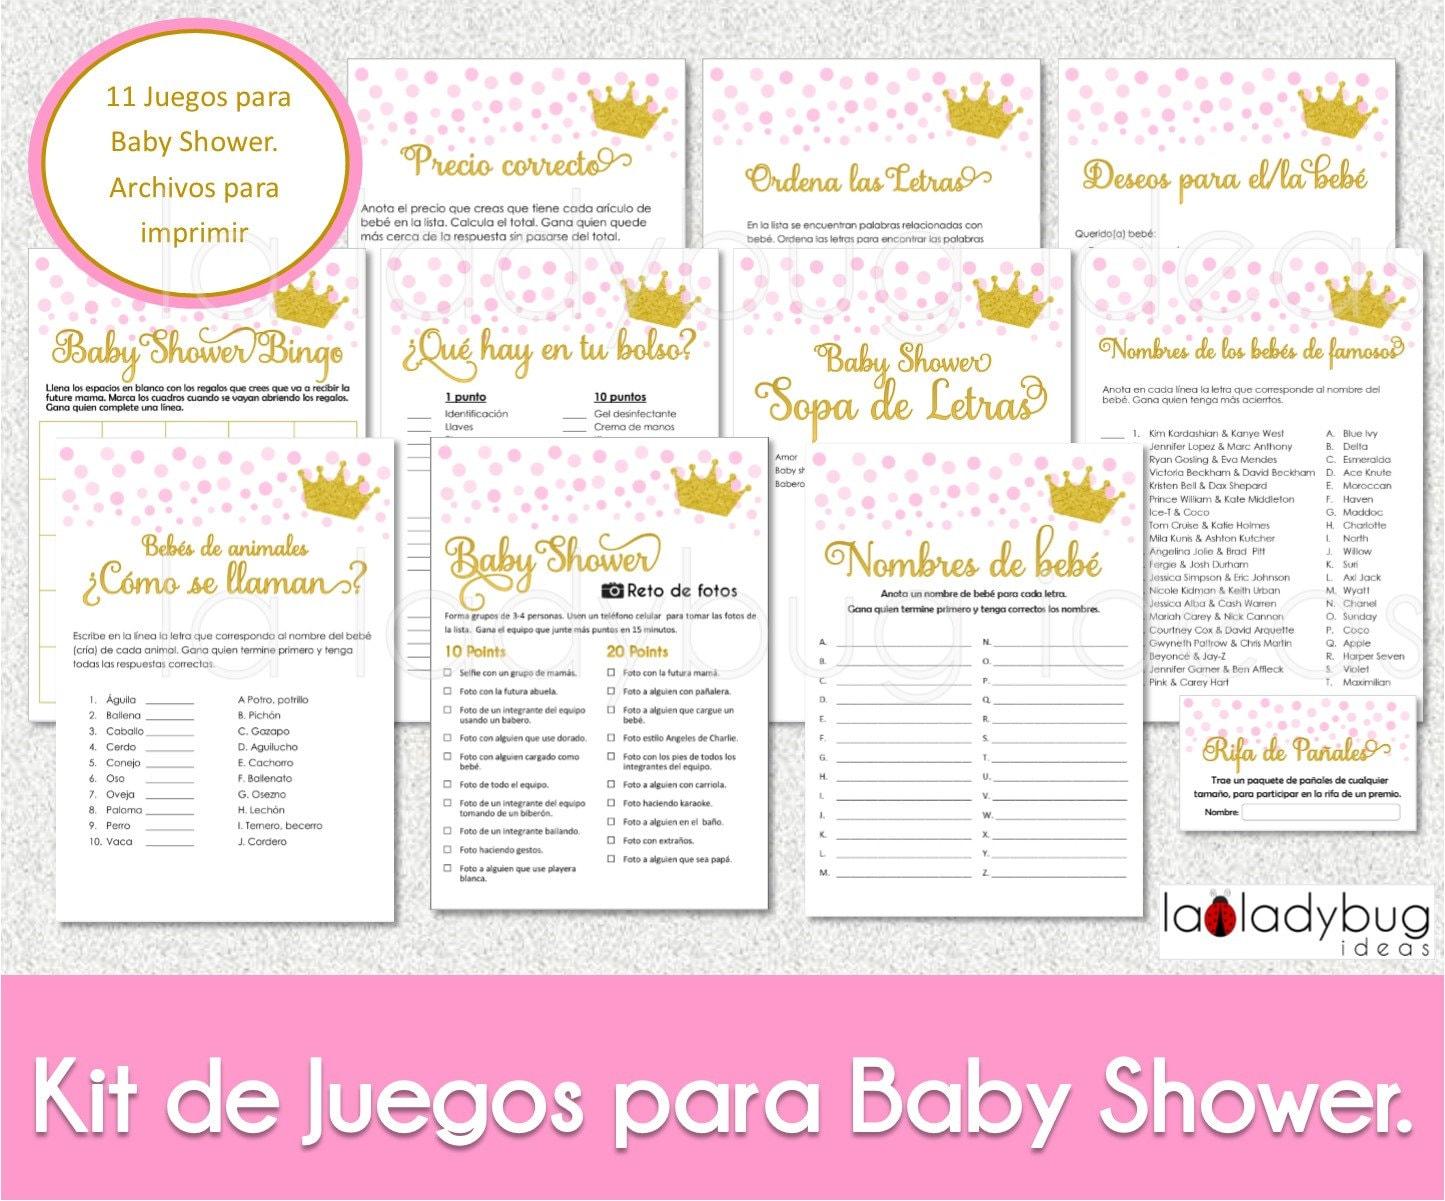 Juegos Divertidos Para Baby Shower Mixto Para Imprimir Rjmovers Com